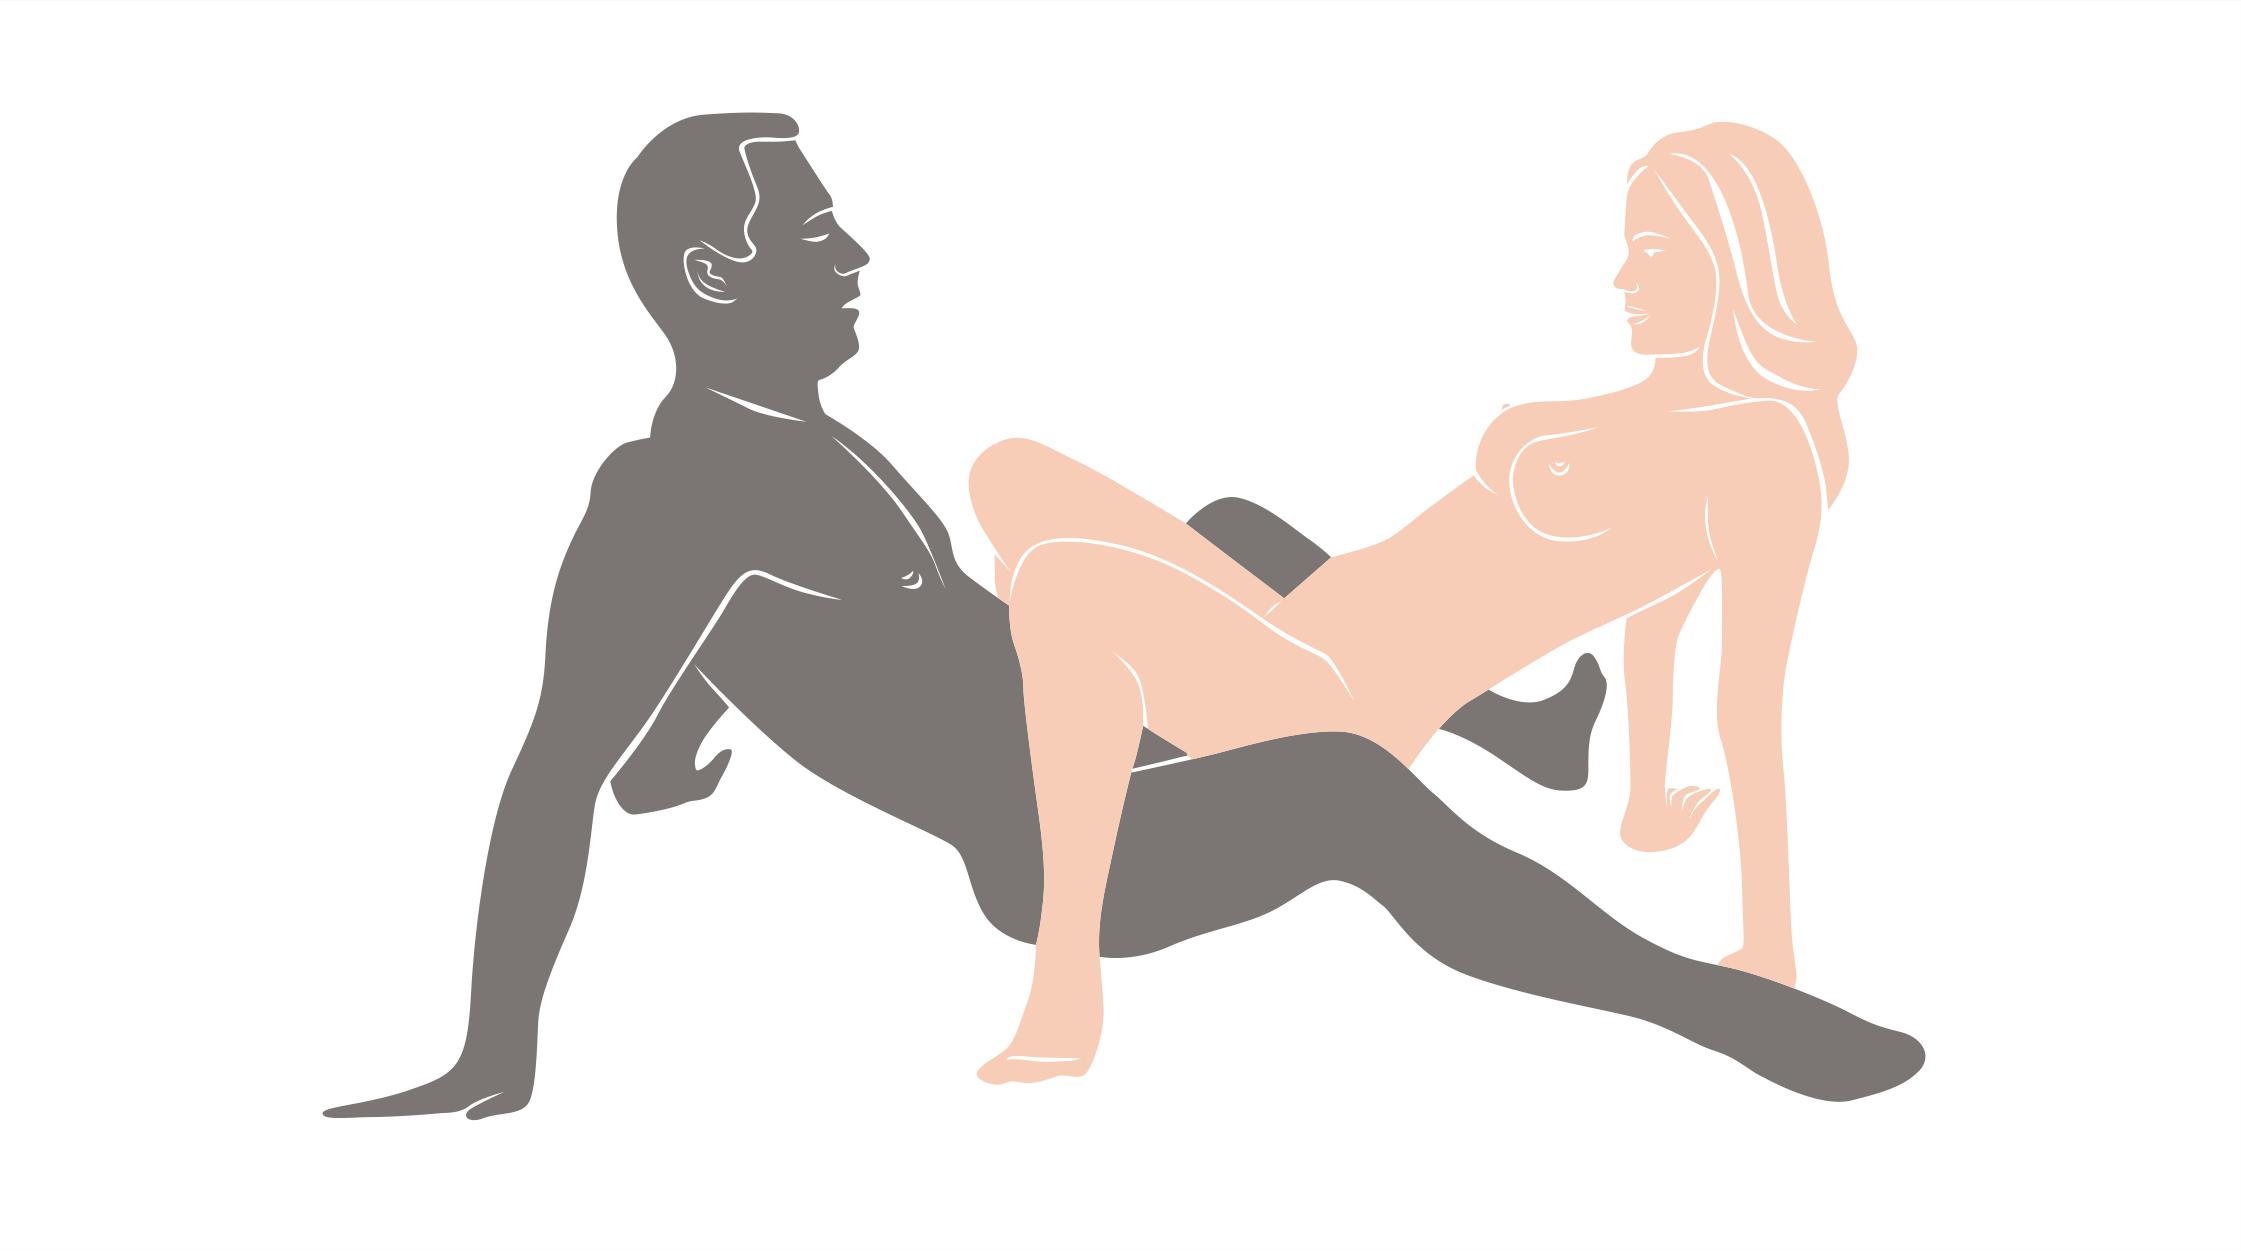 tatlı günah seks pozisyonu